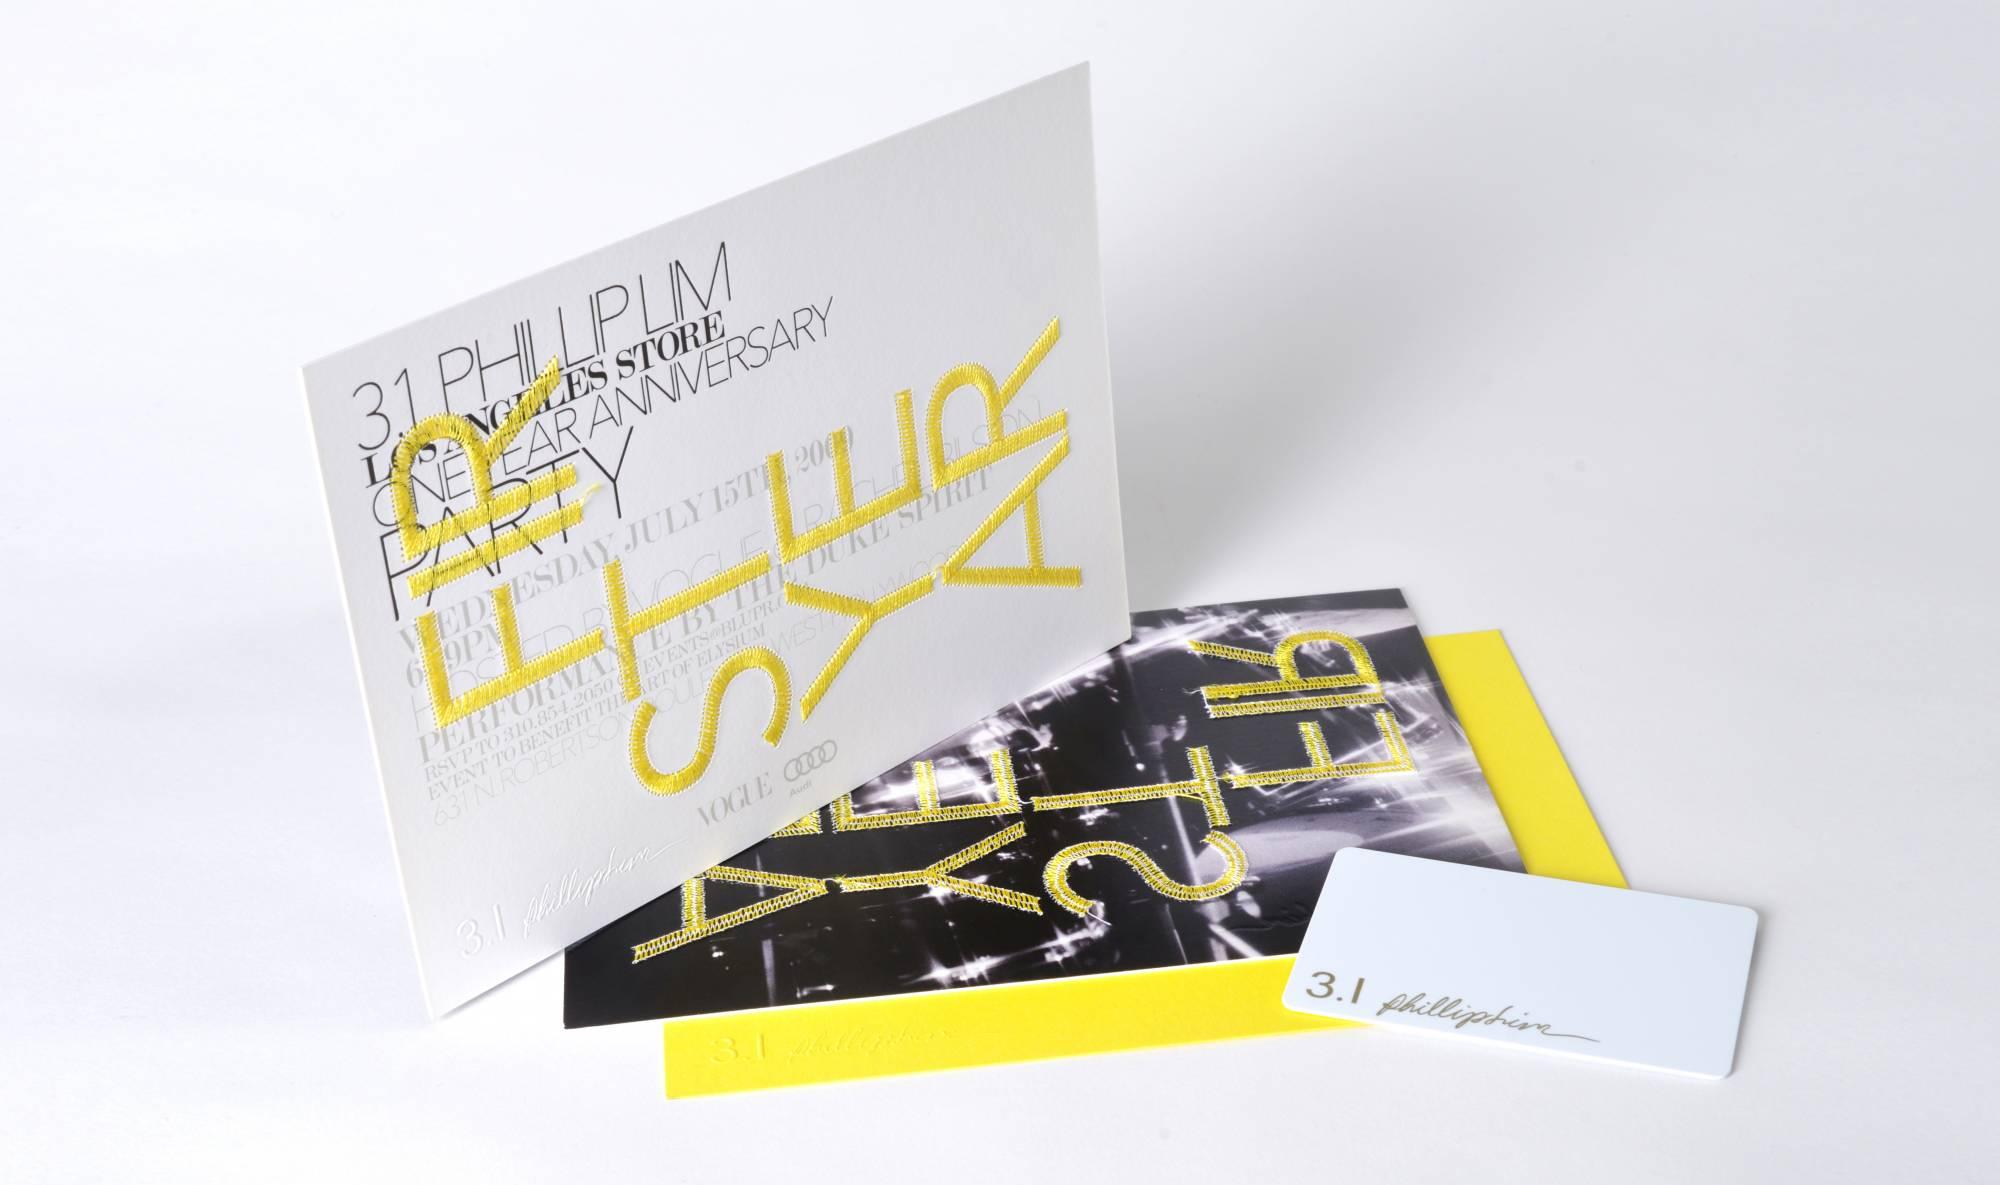 Roxane Zargham 3 1 Phillip Lim Invitation Design La Store Anniversary